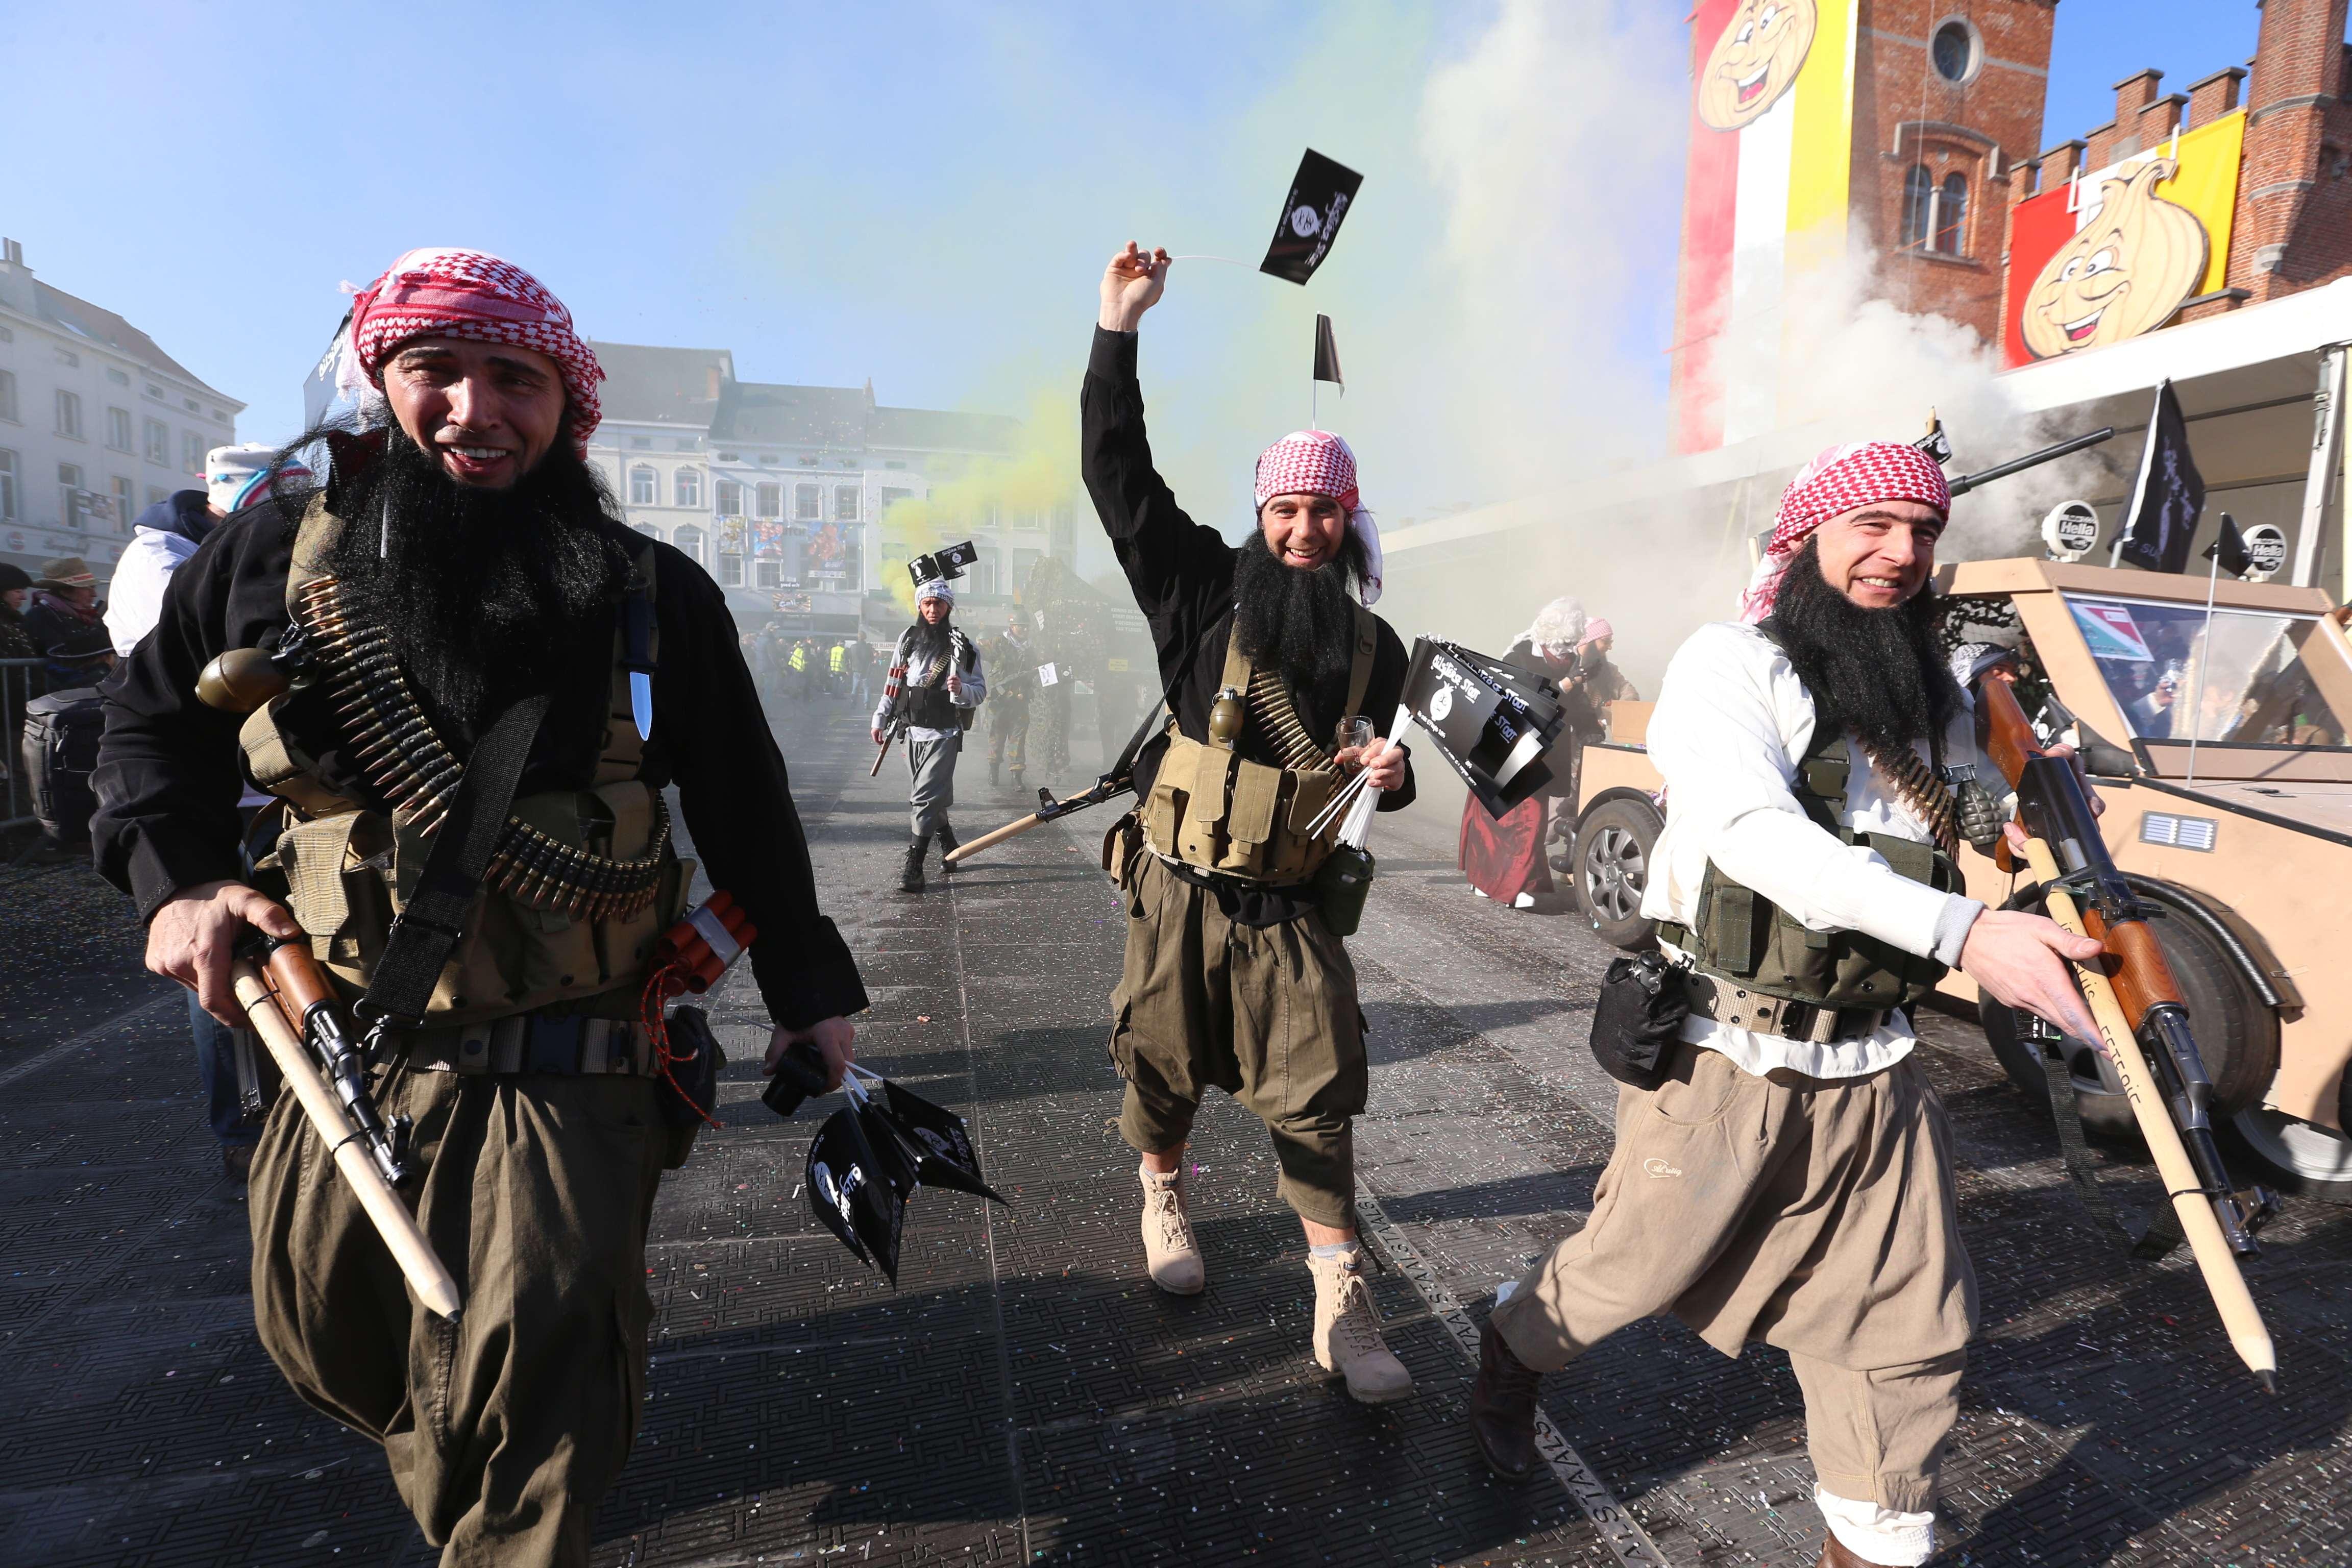 Parade mocks ISIS (AFP)